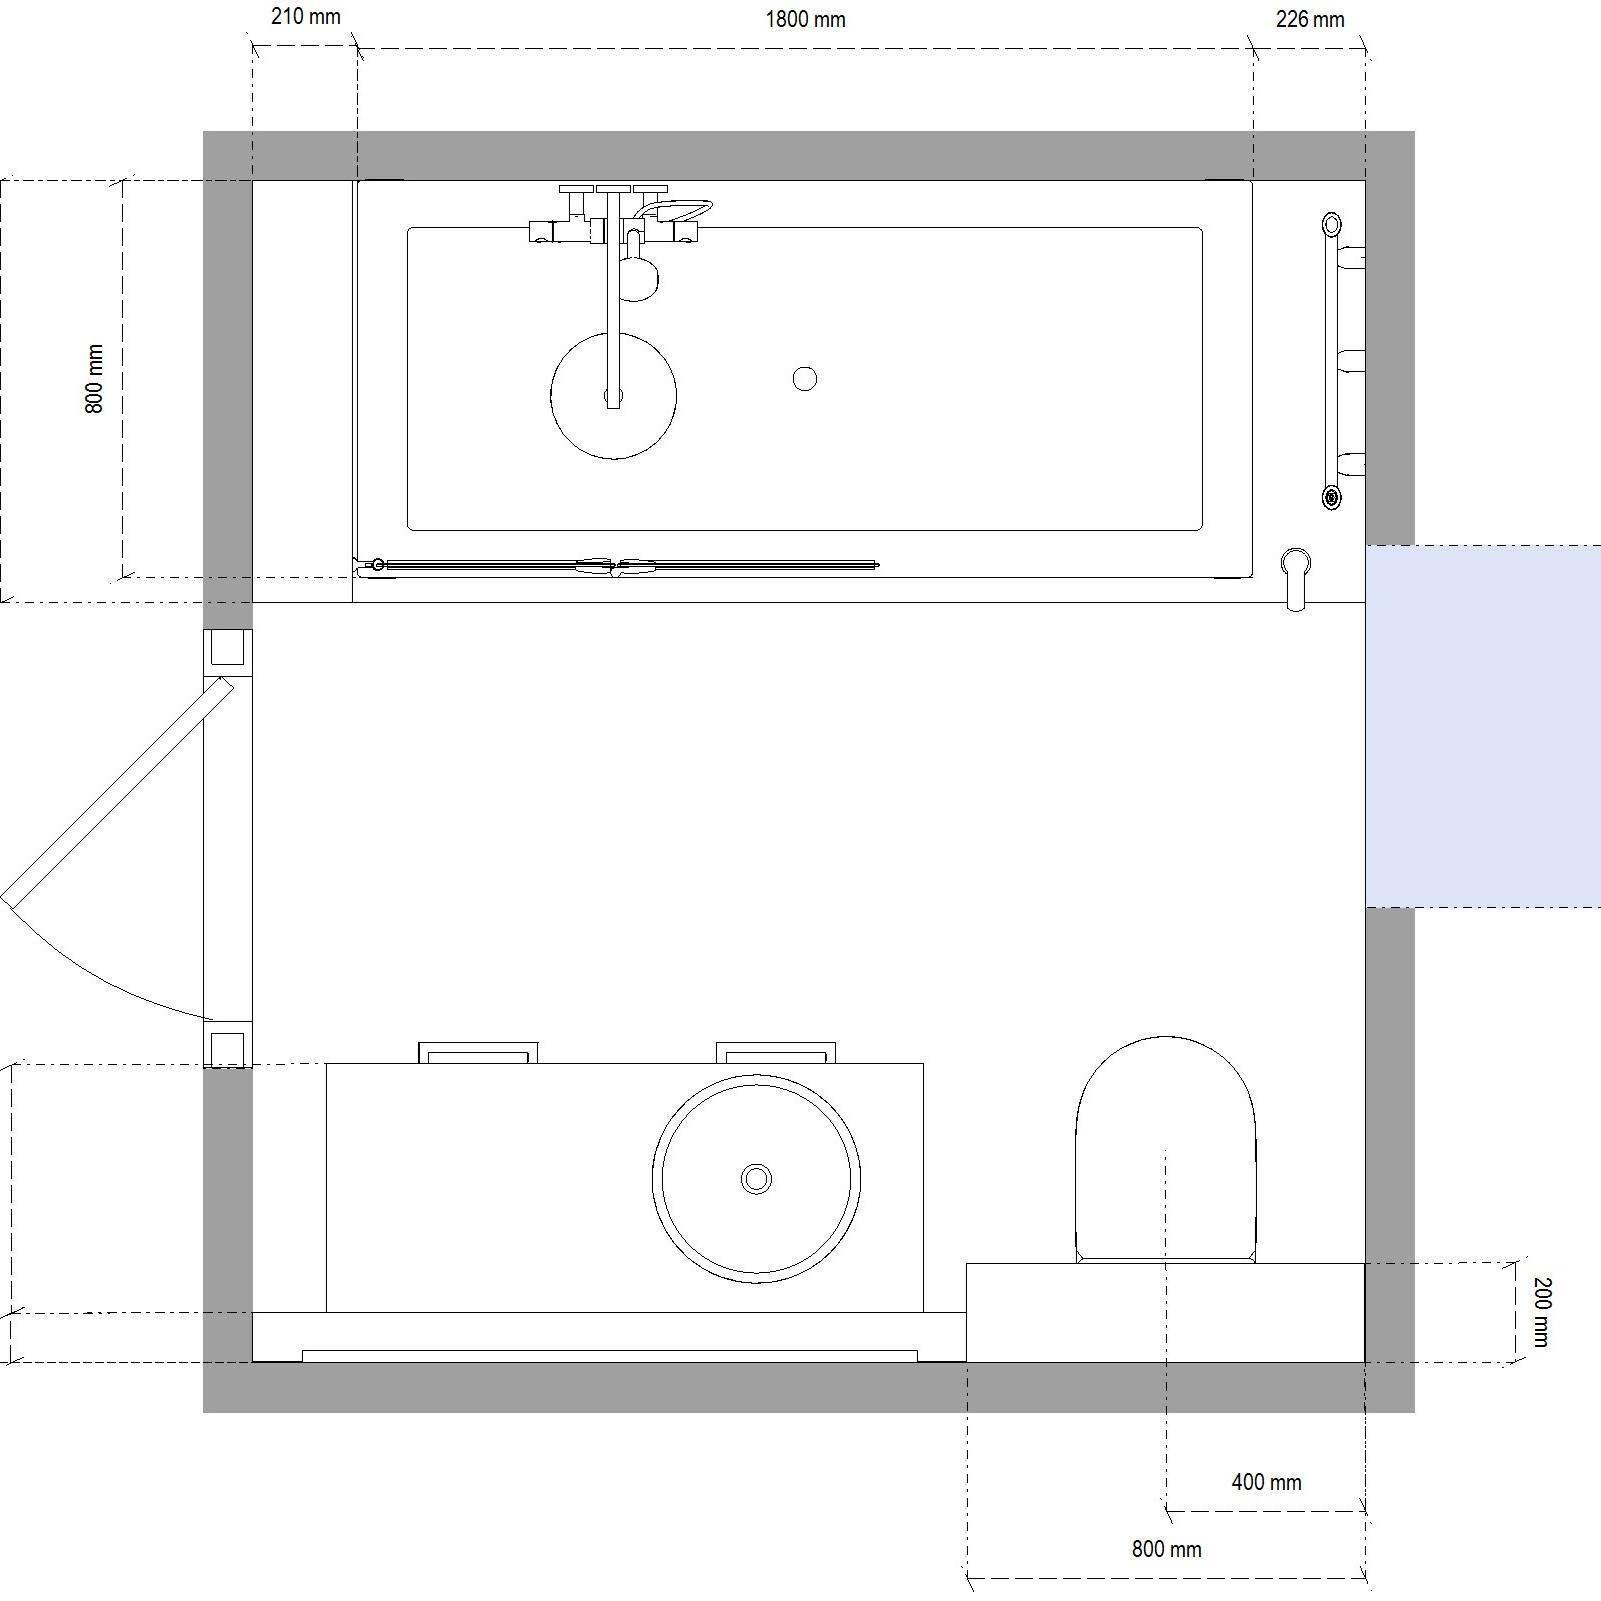 Final Dimensional Plan.jpg